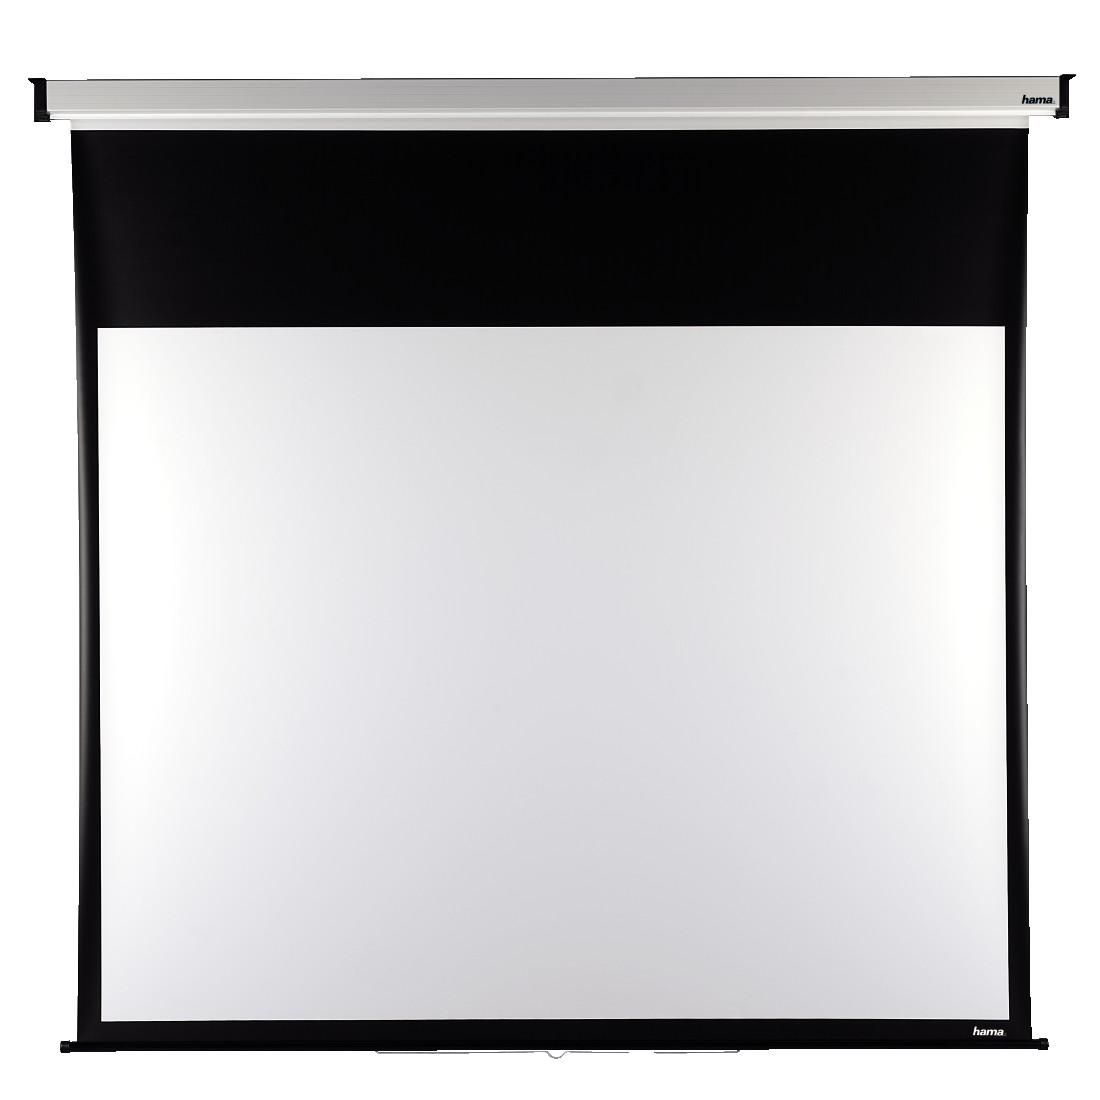 Проекторен екран за стена HAMA 18782, 200 x 175 cm, 4:3